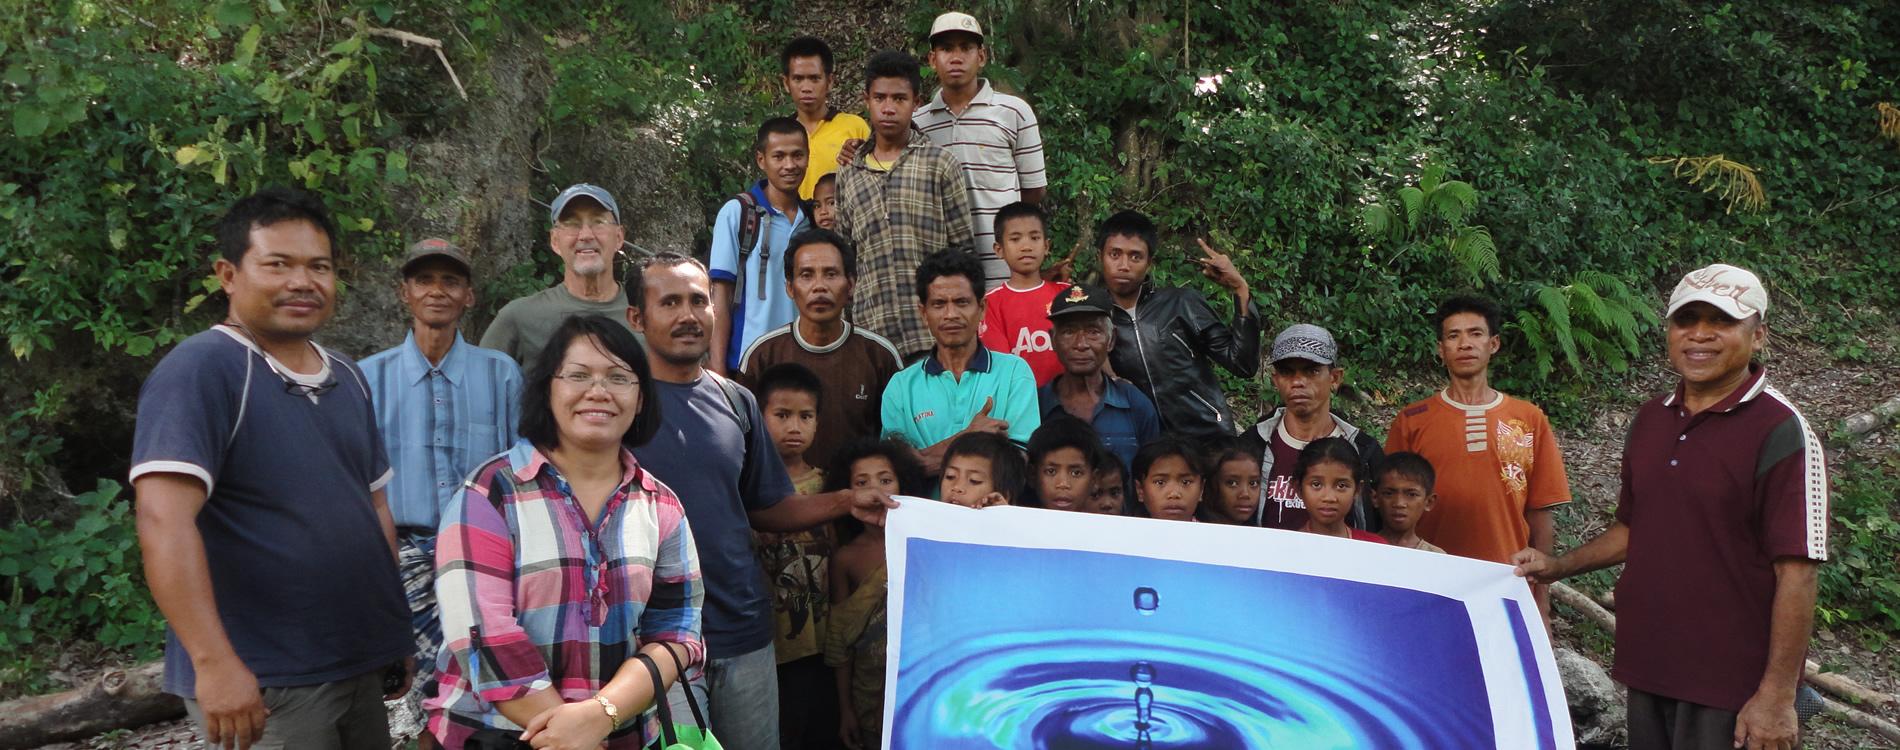 Reaching Indonesians through Indonesians